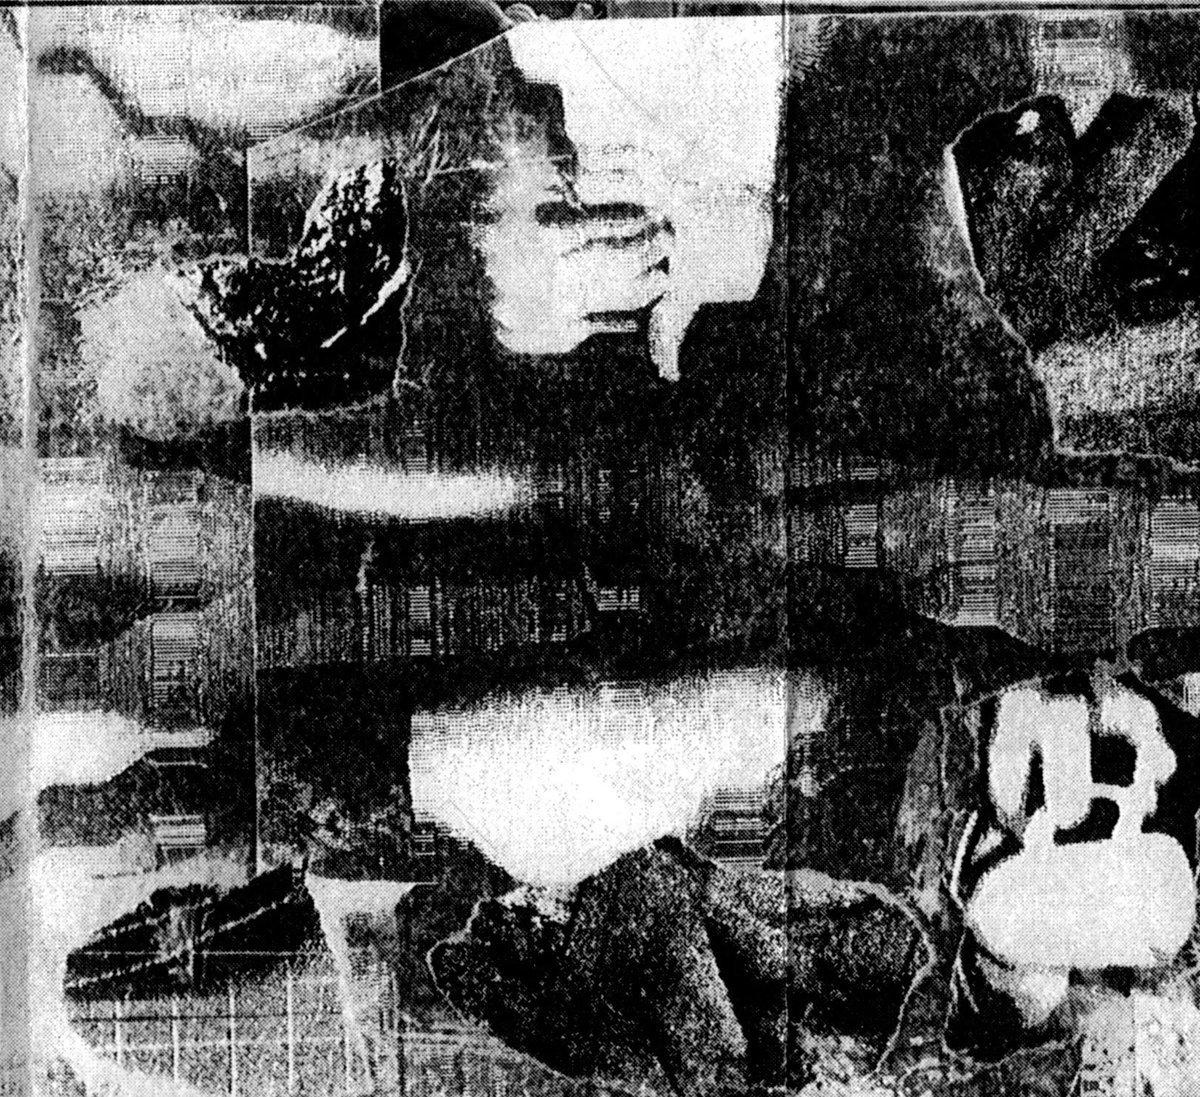 Lasse Marhaug - White Inferno CD - 画像1